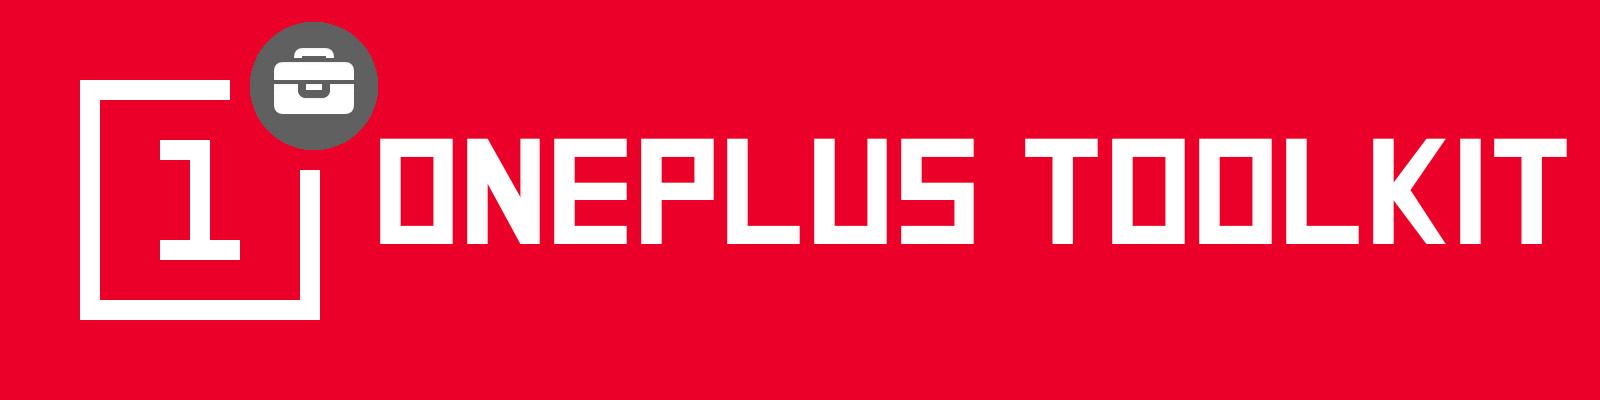 OnePlus Toolkit